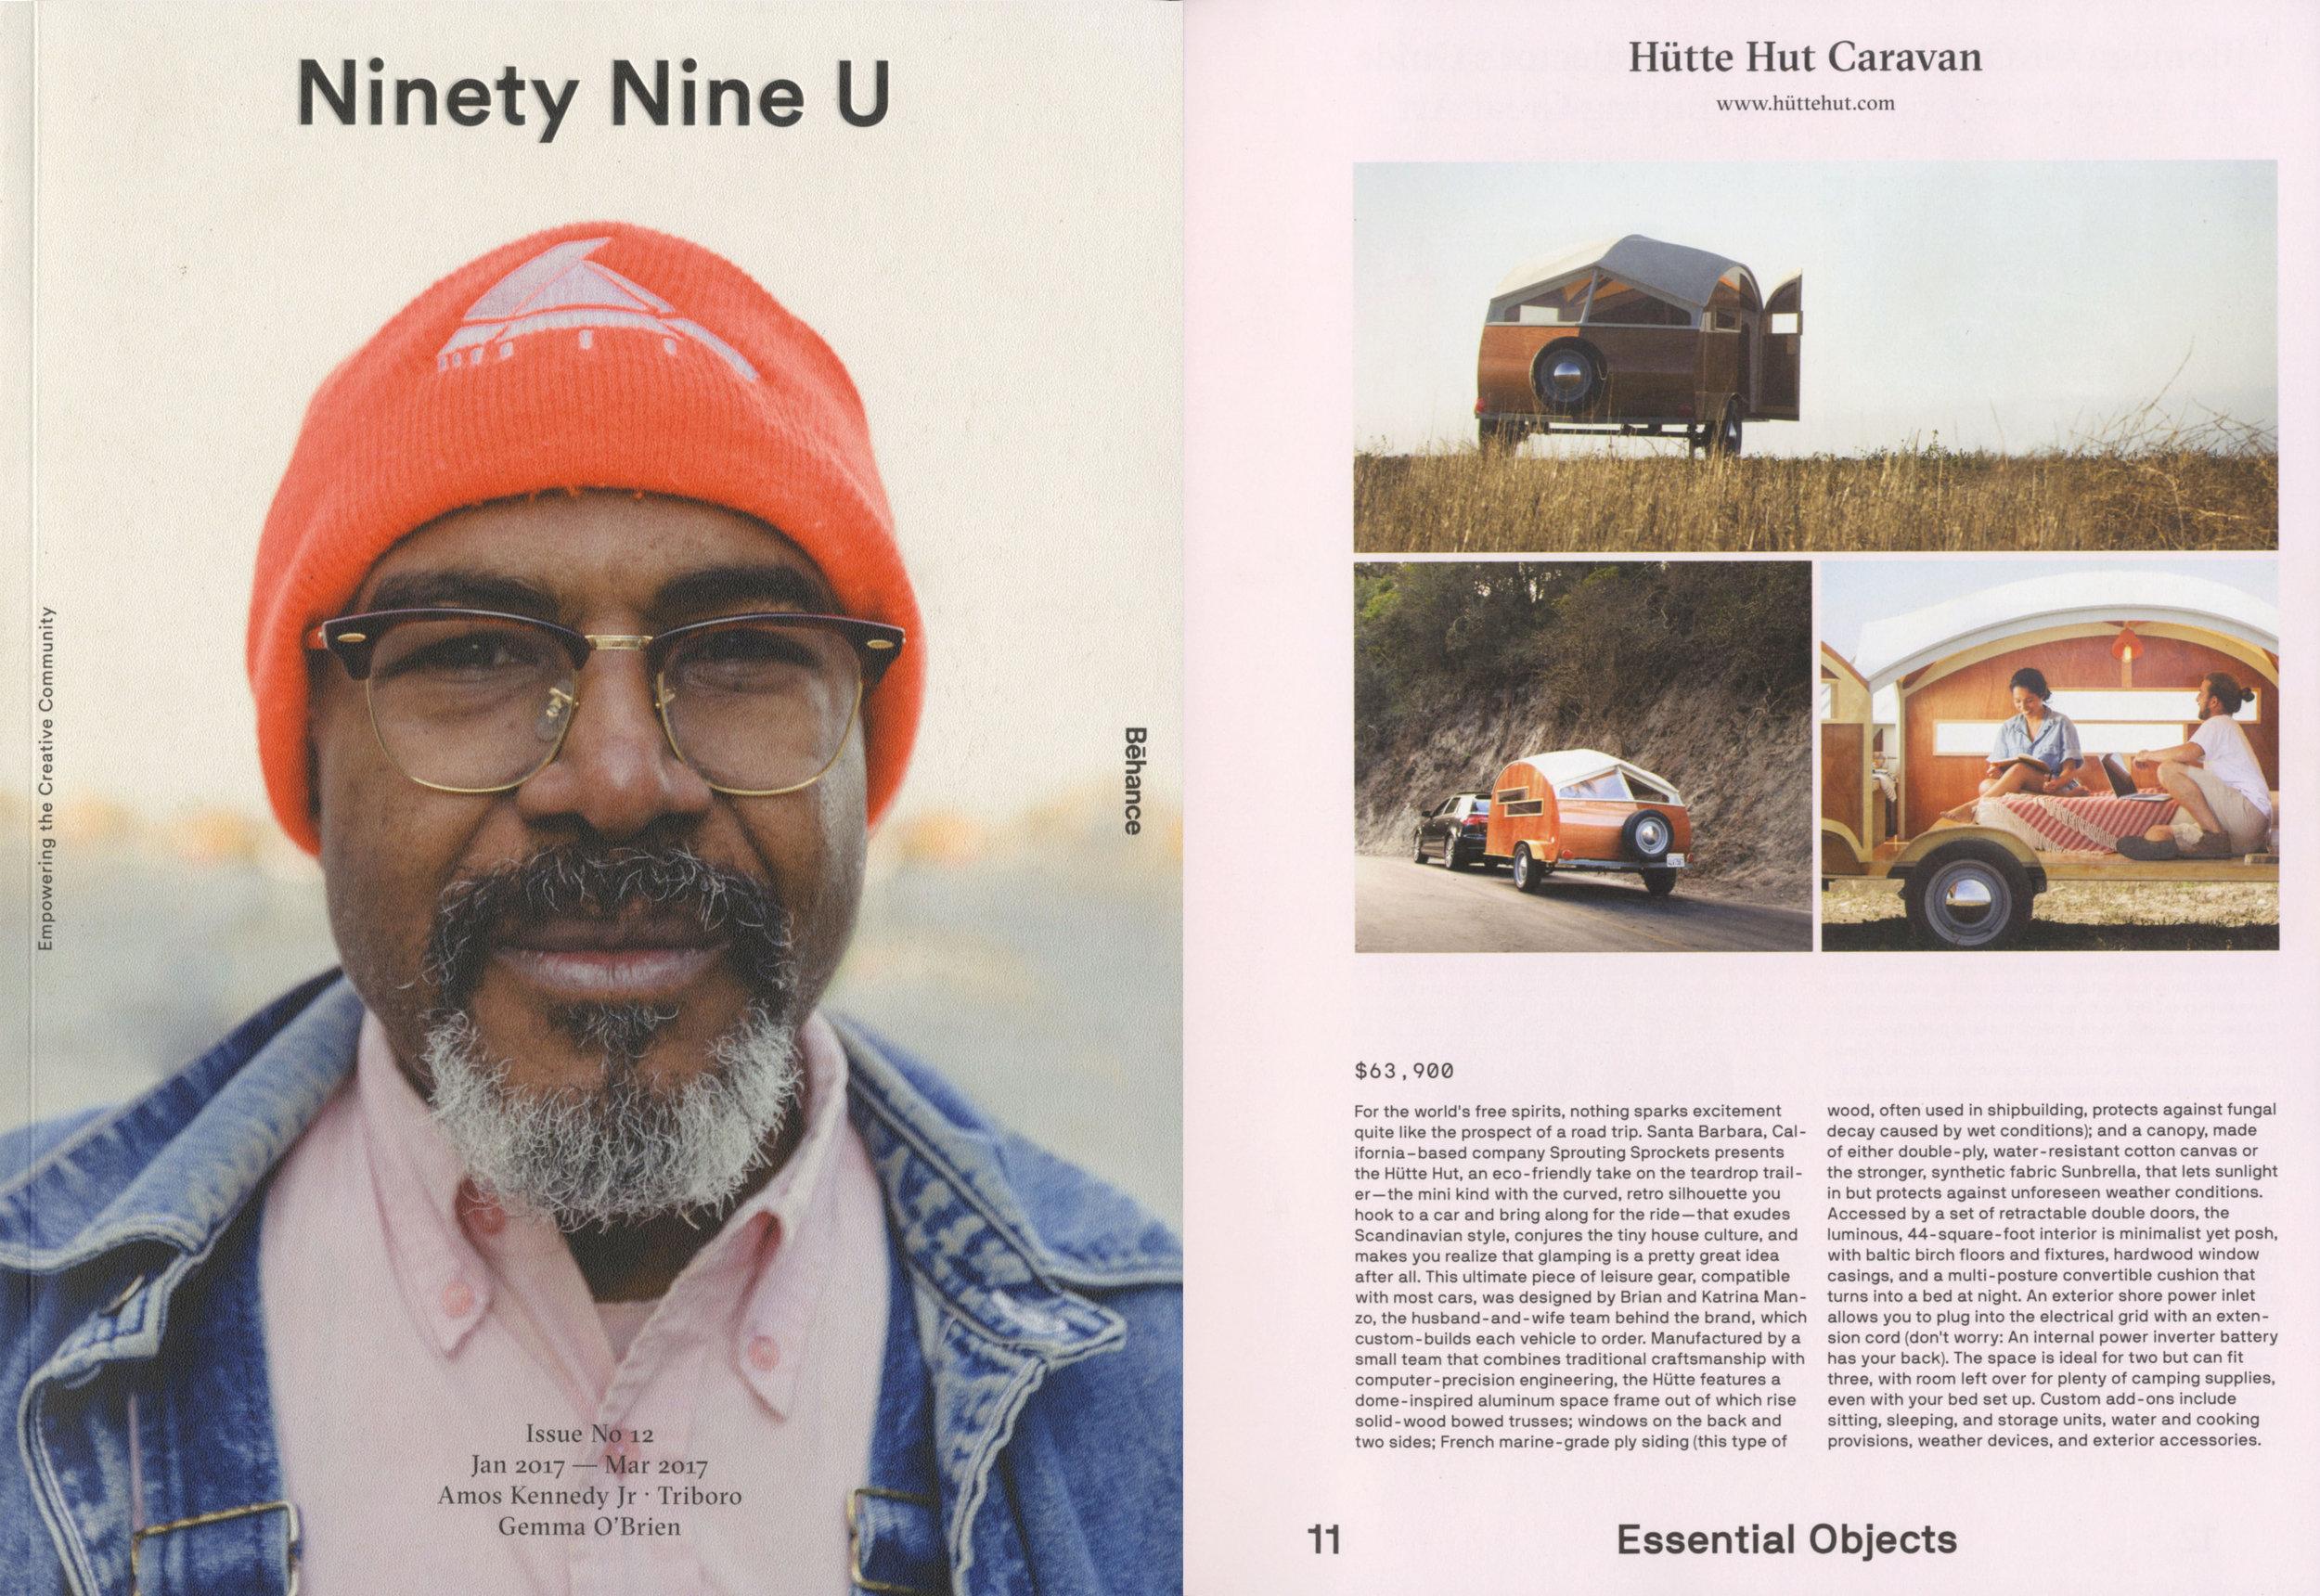 99U  Issue No. 12